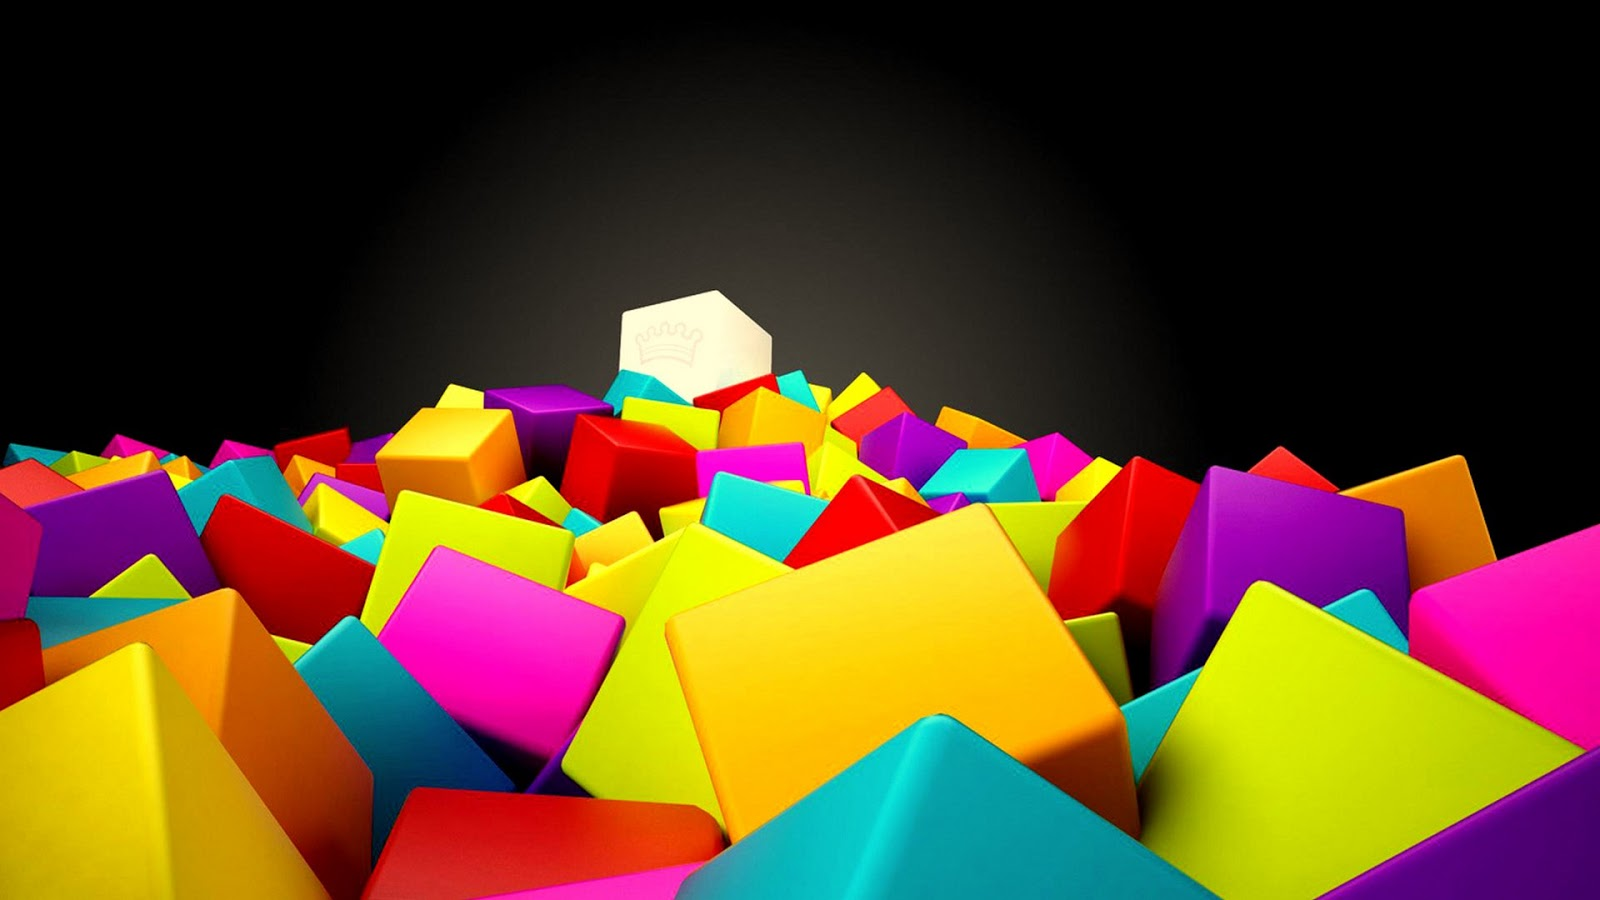 Colorful Box Wallpaper - Colorful Box Wallpaper